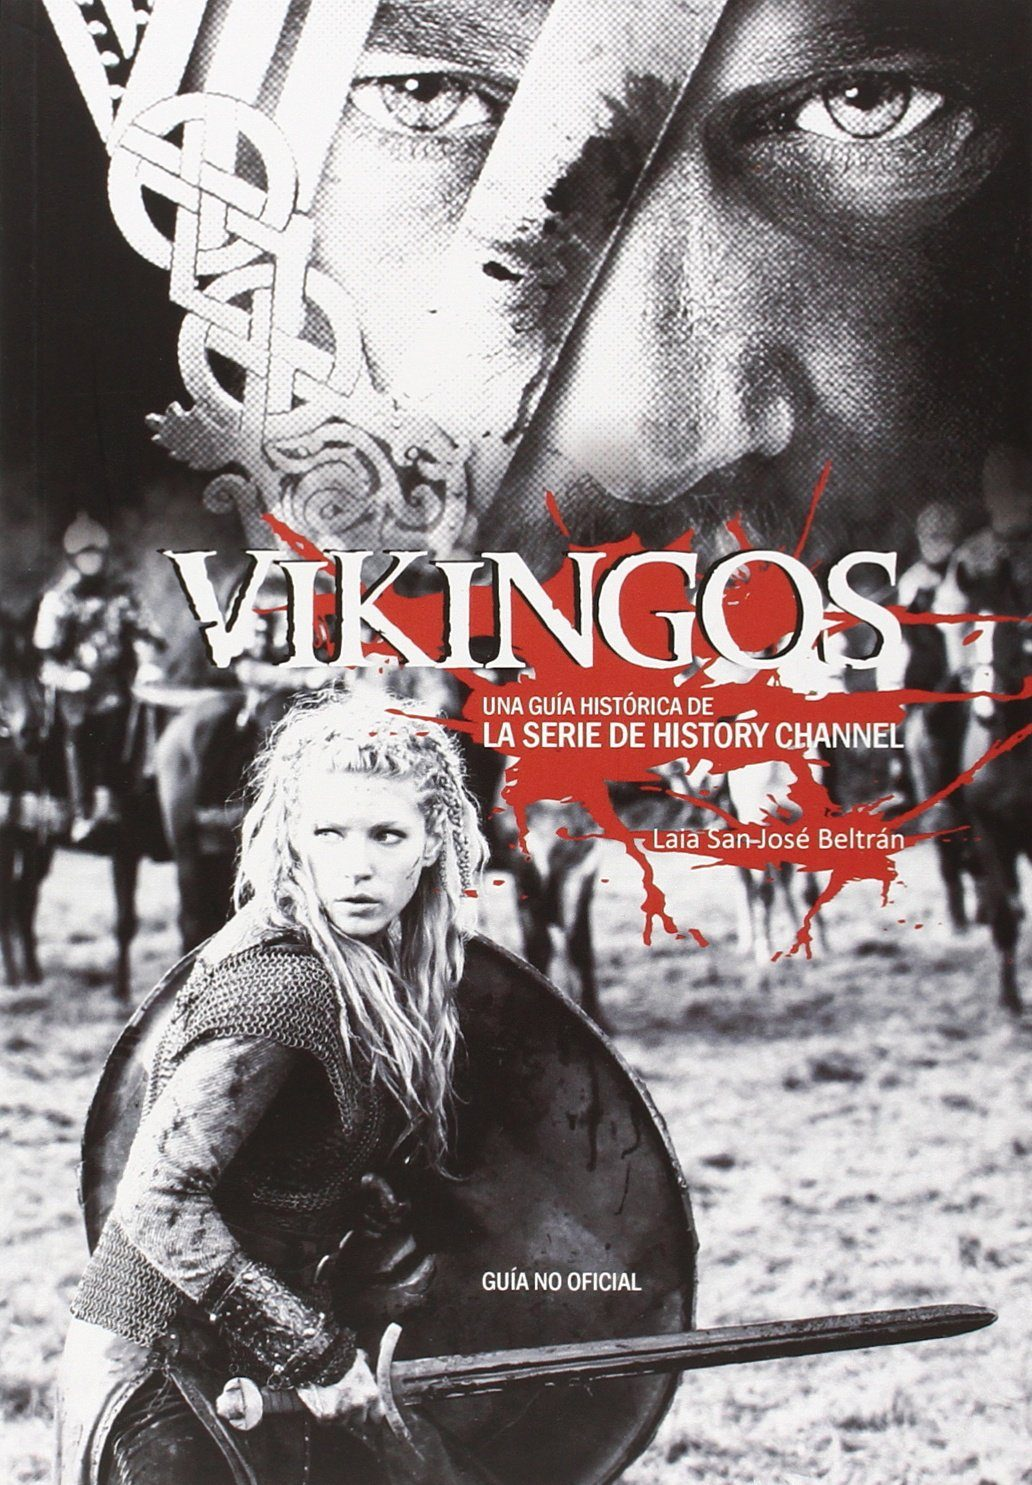 Mejores Libros de Vikingos